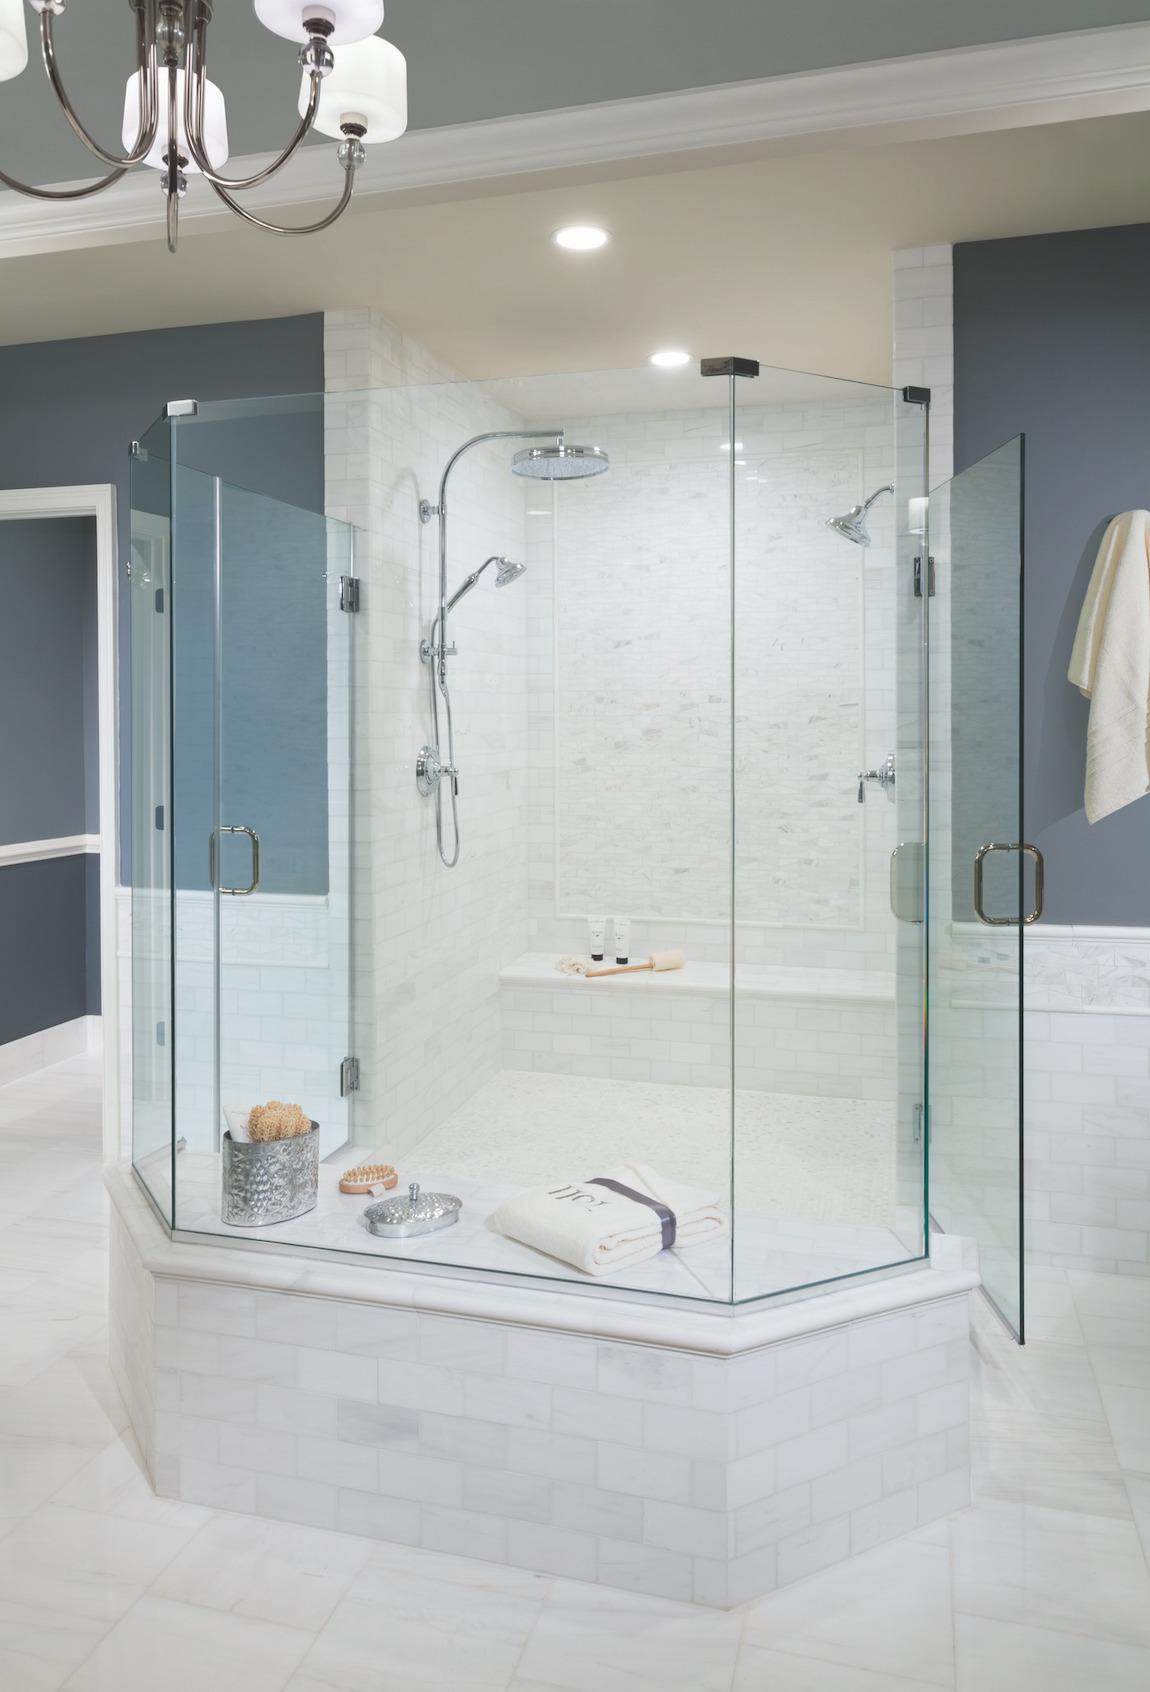 Luxurious showerhead in spacious shower.